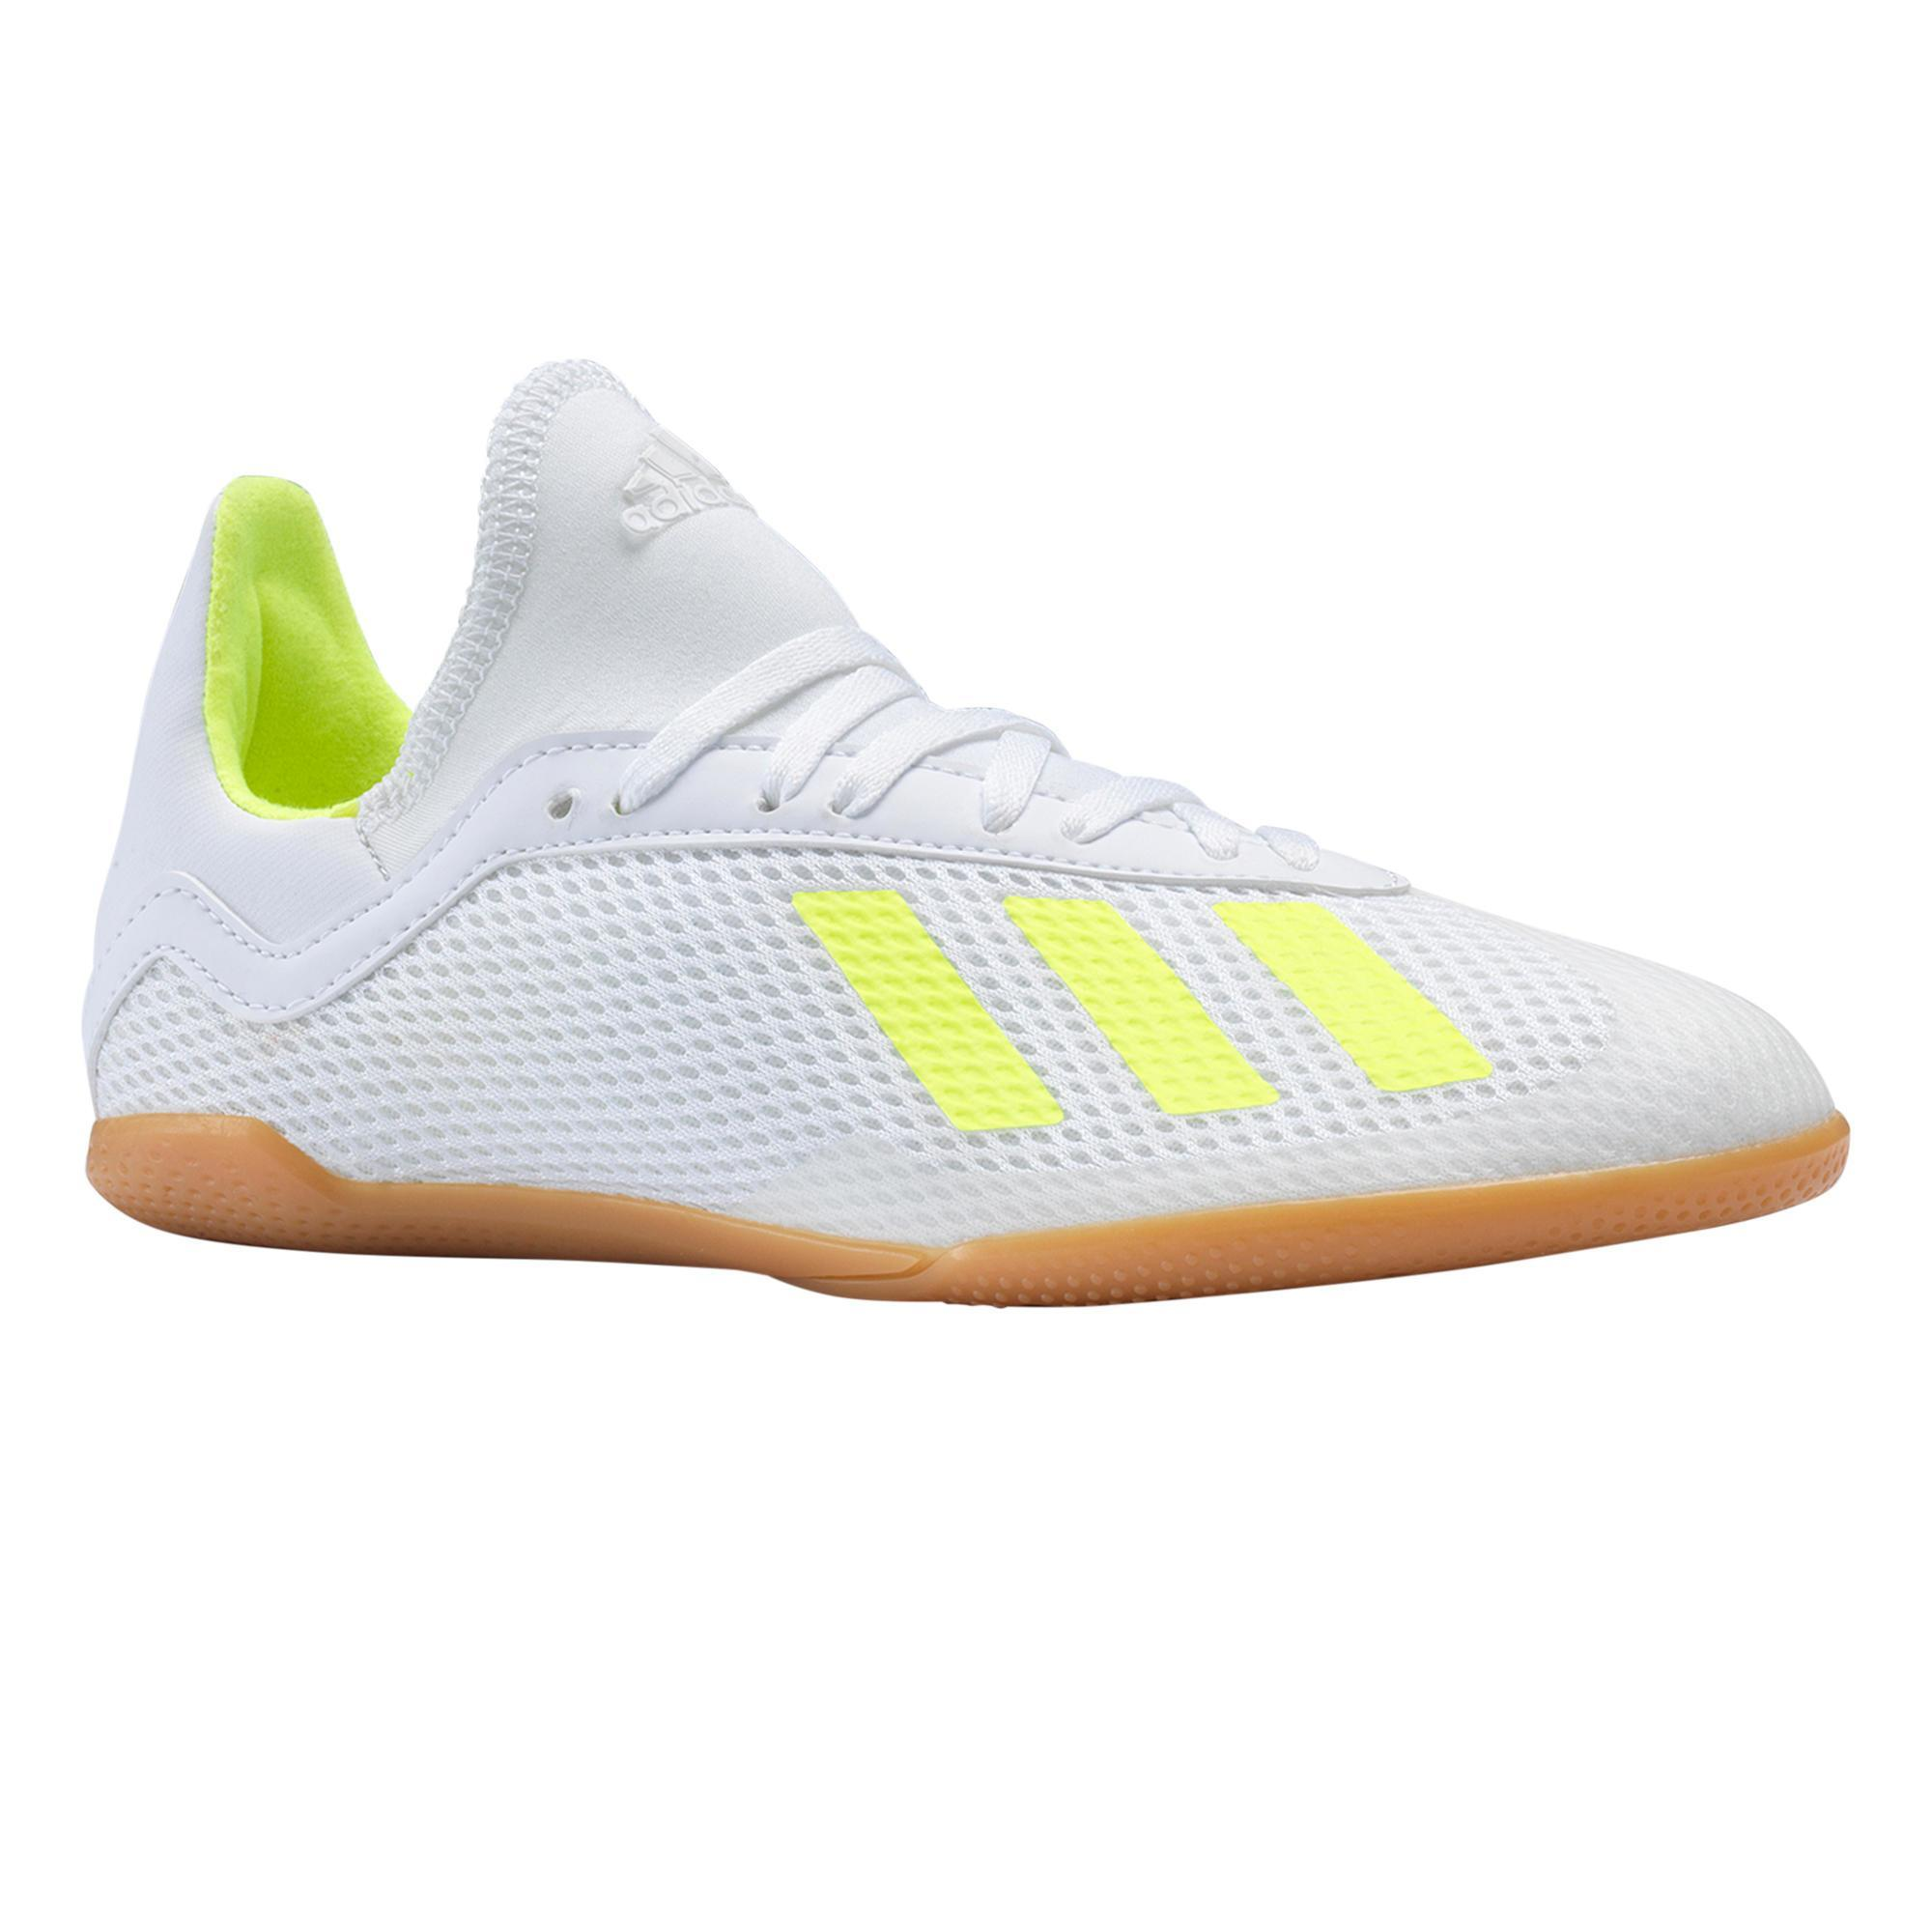 623456e3858c9 Comprar Zapatillas de Fútbol Sala online